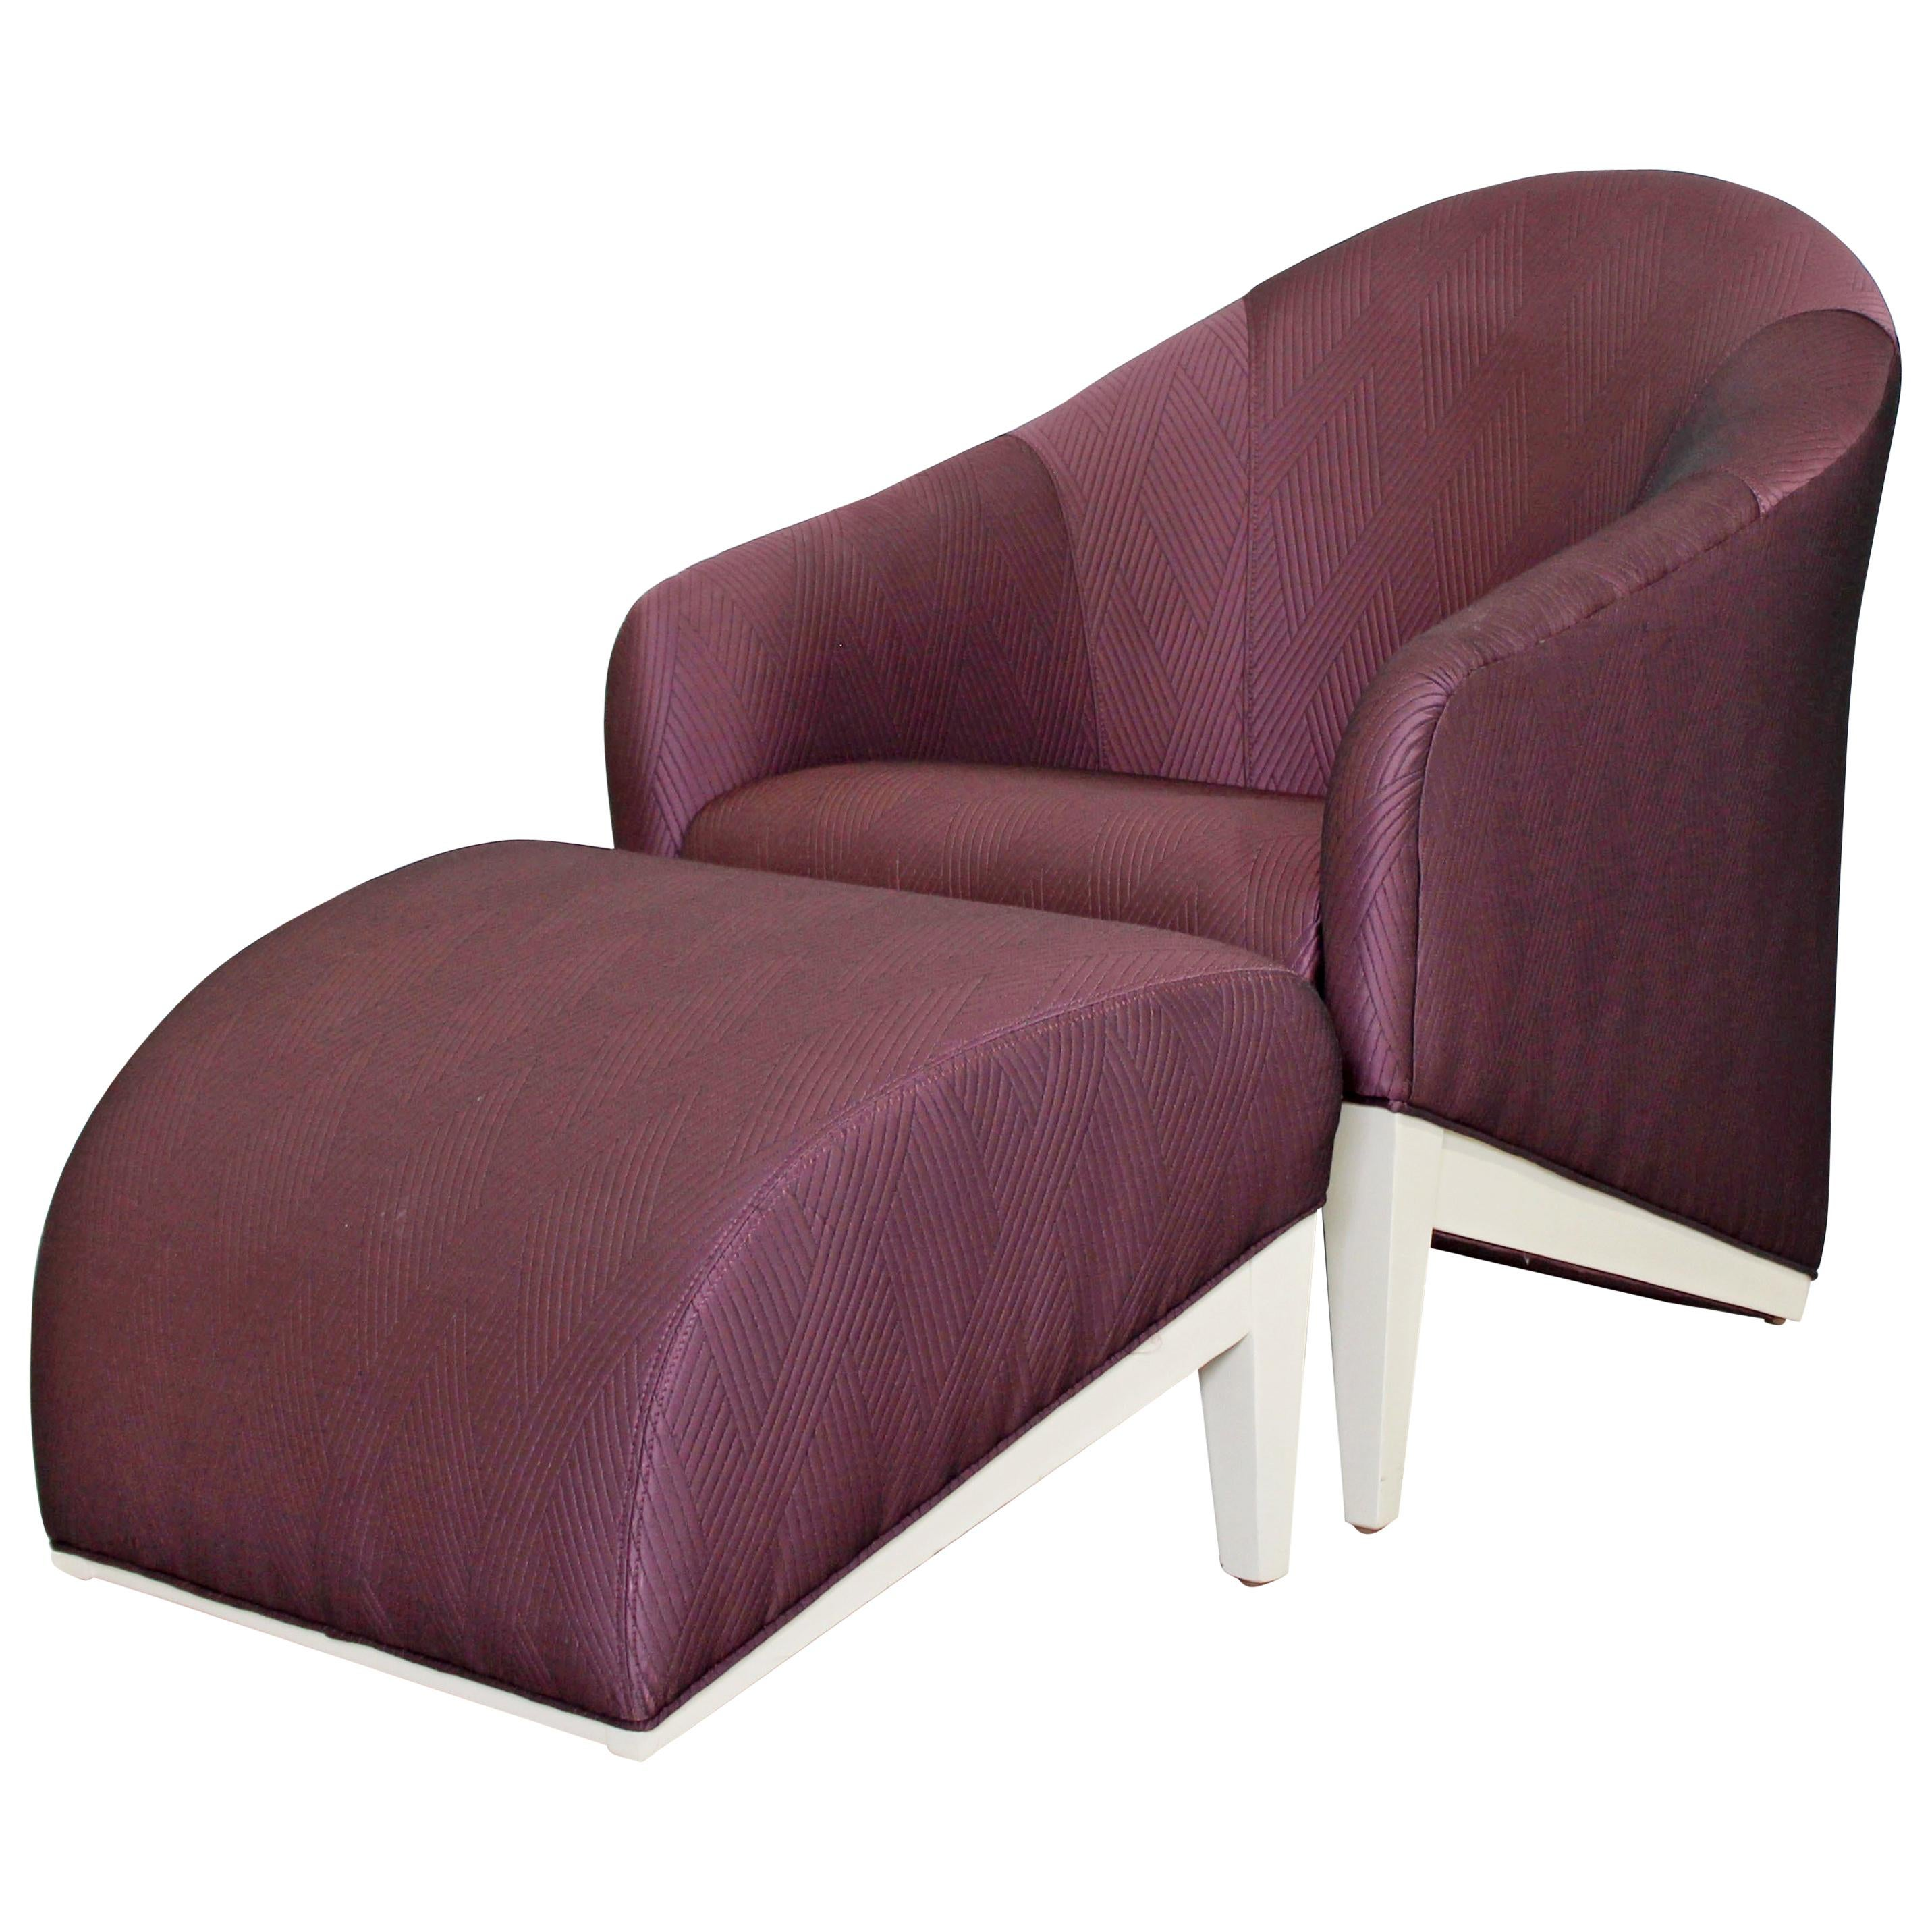 Contemporary Modern Lounge Chair & Ottoman